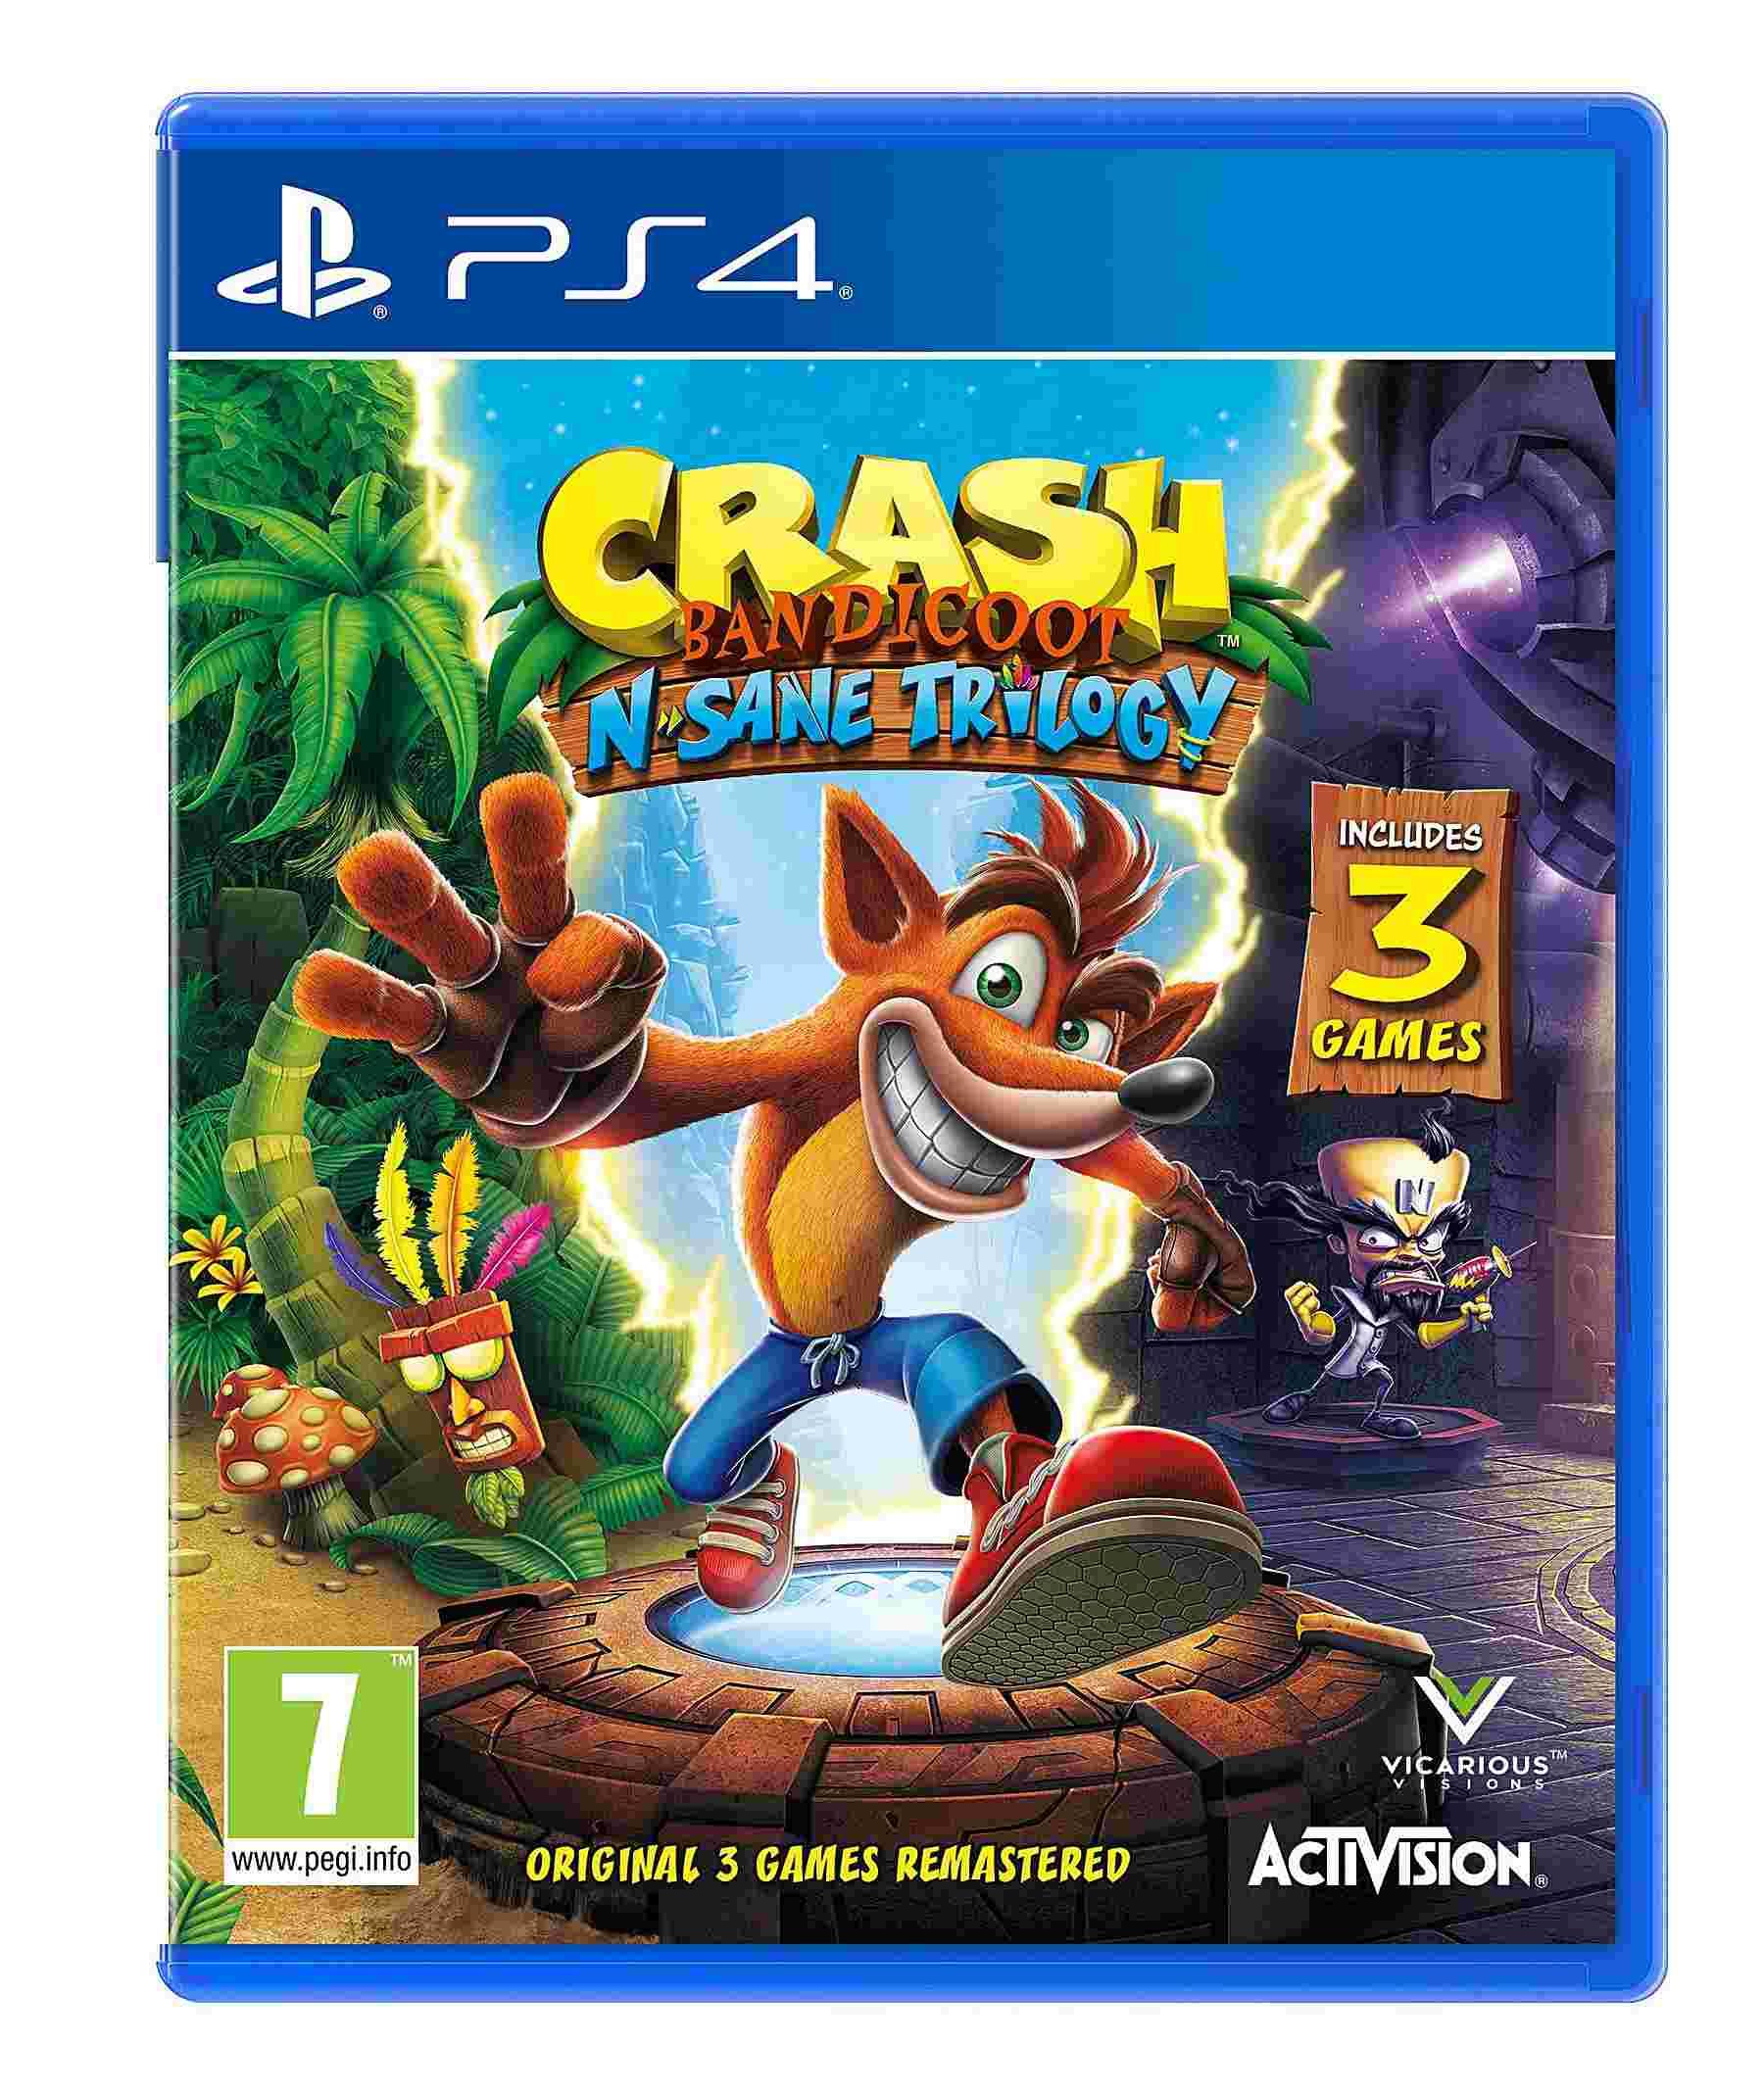 ¿Remake o Remastered? Crash Bandicoot N.Sane Trilogy Dq635_10